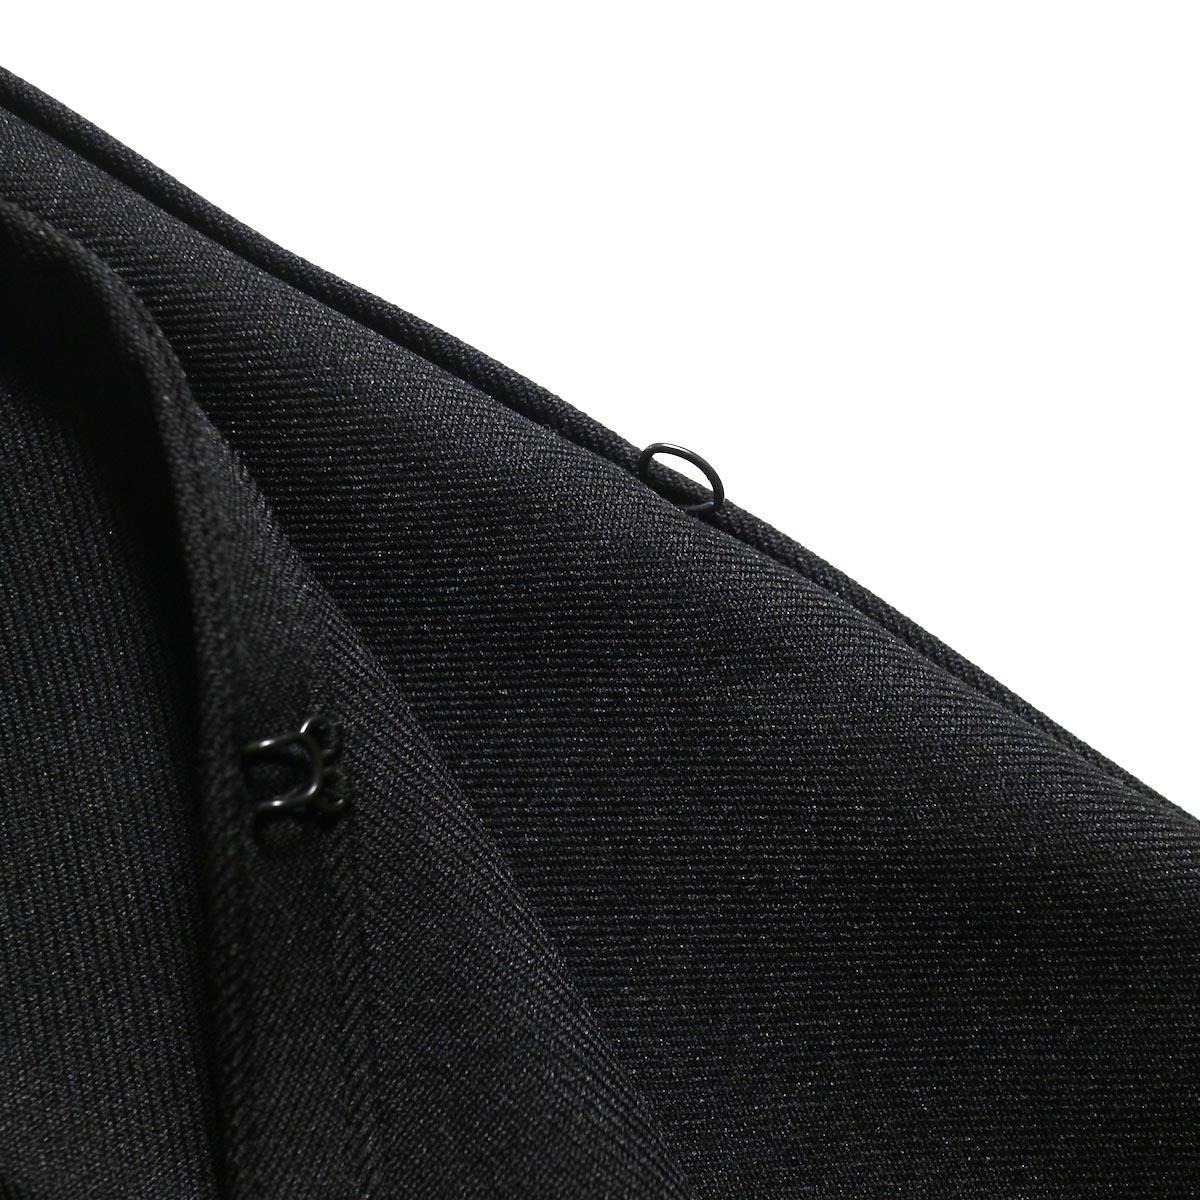 PRE_ / ZK OPEN PANTS (Black)フック